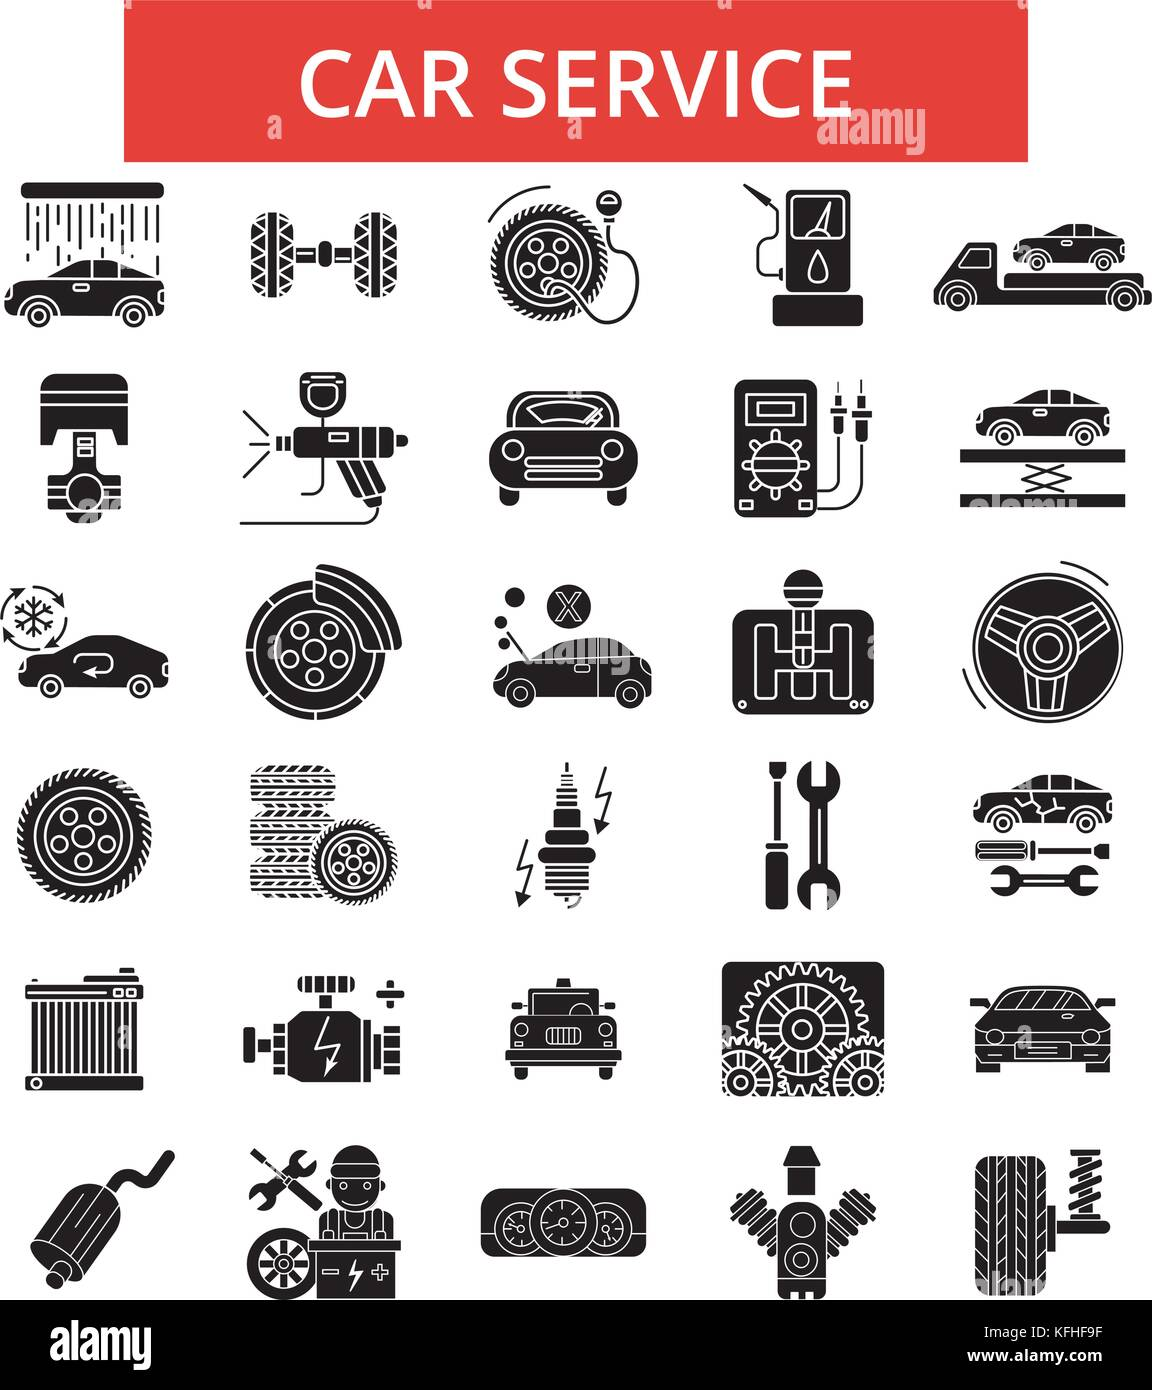 auto service abbildung d nne linie symbole lineare. Black Bedroom Furniture Sets. Home Design Ideas